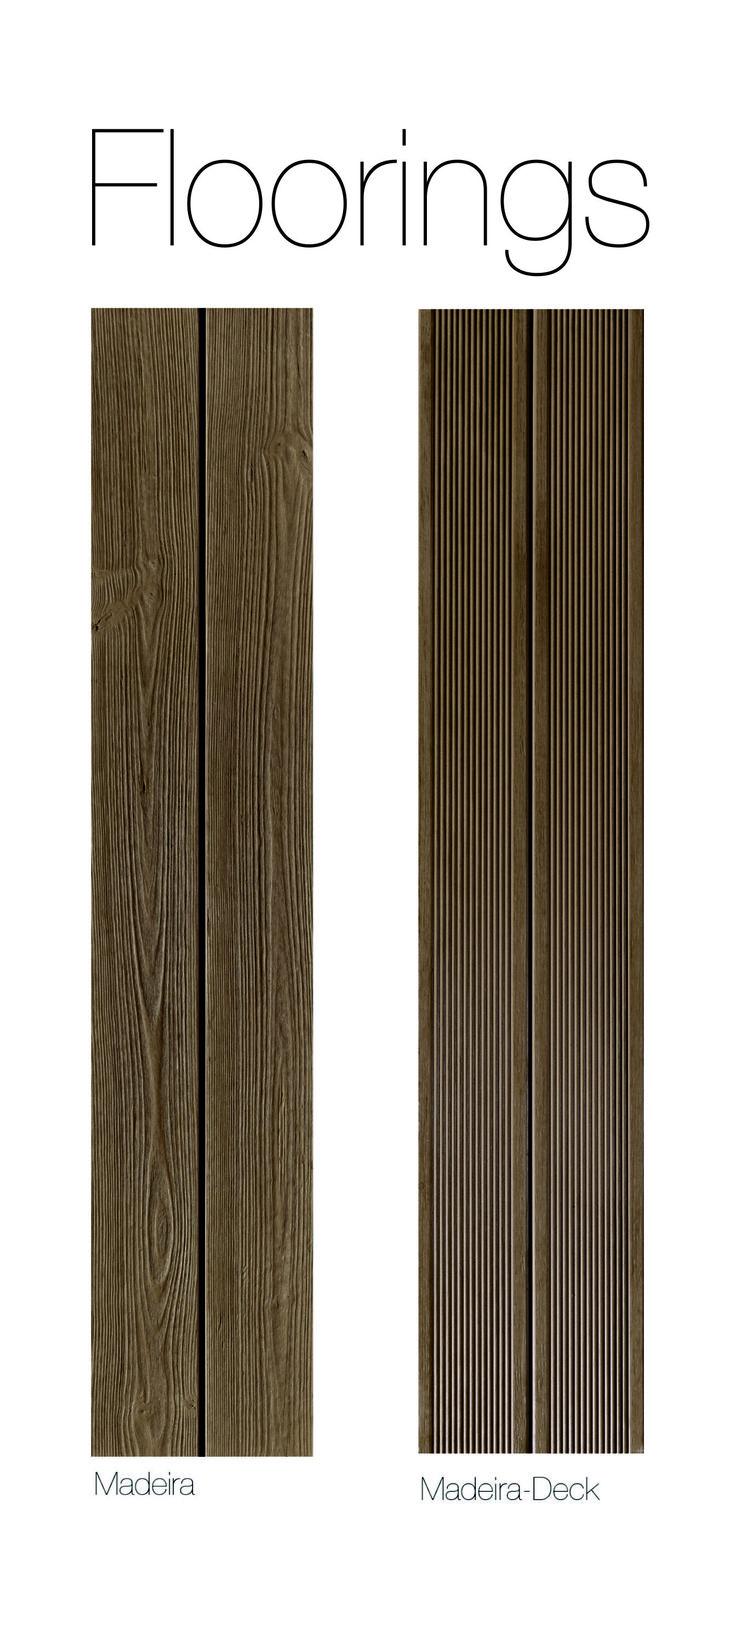 Deixe-se encantar pela textura da madeira! Pavimento Madeira Pavimento Madeira-Deck  Let yourself be chamed by the wood texture! Madeira Flooring Madeira-Deck Flooring  #acl #acimenteiradolouro #pavimentos #Floorings